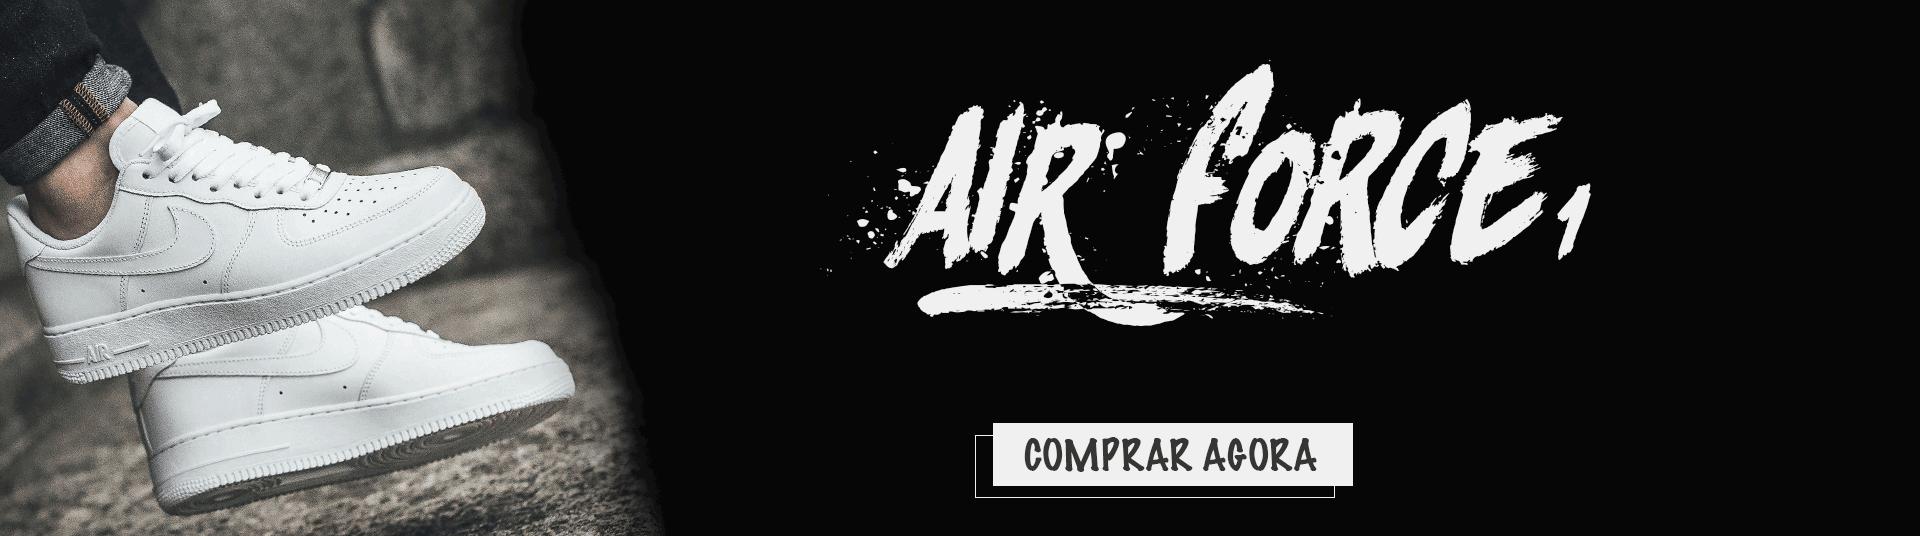 Banner Airforce